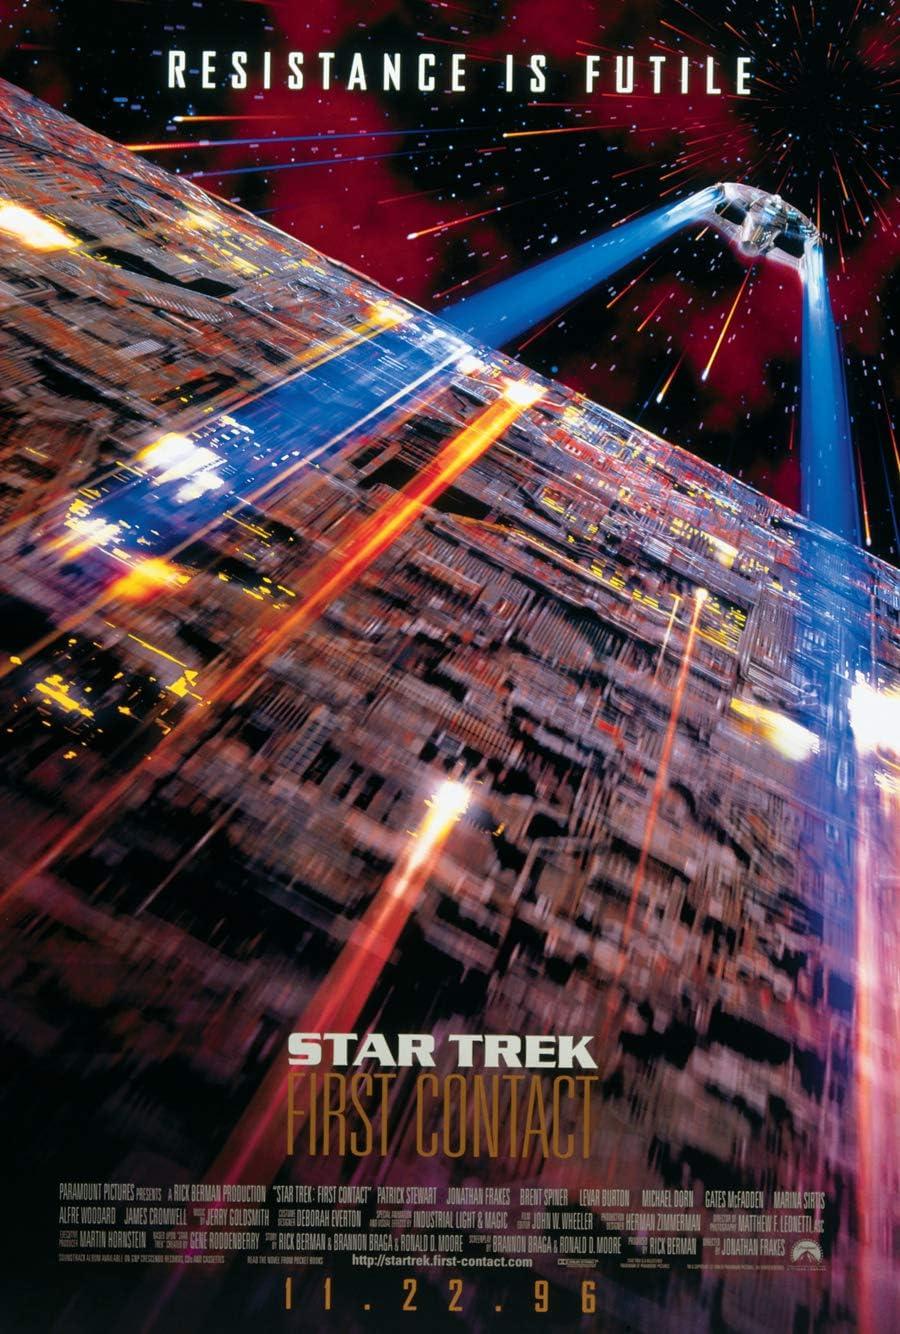 STAR TREK FIRST CONTACT MOVIE POSTER 2 Sided ORIGINAL Advance 27x40 PATRICK STEWART